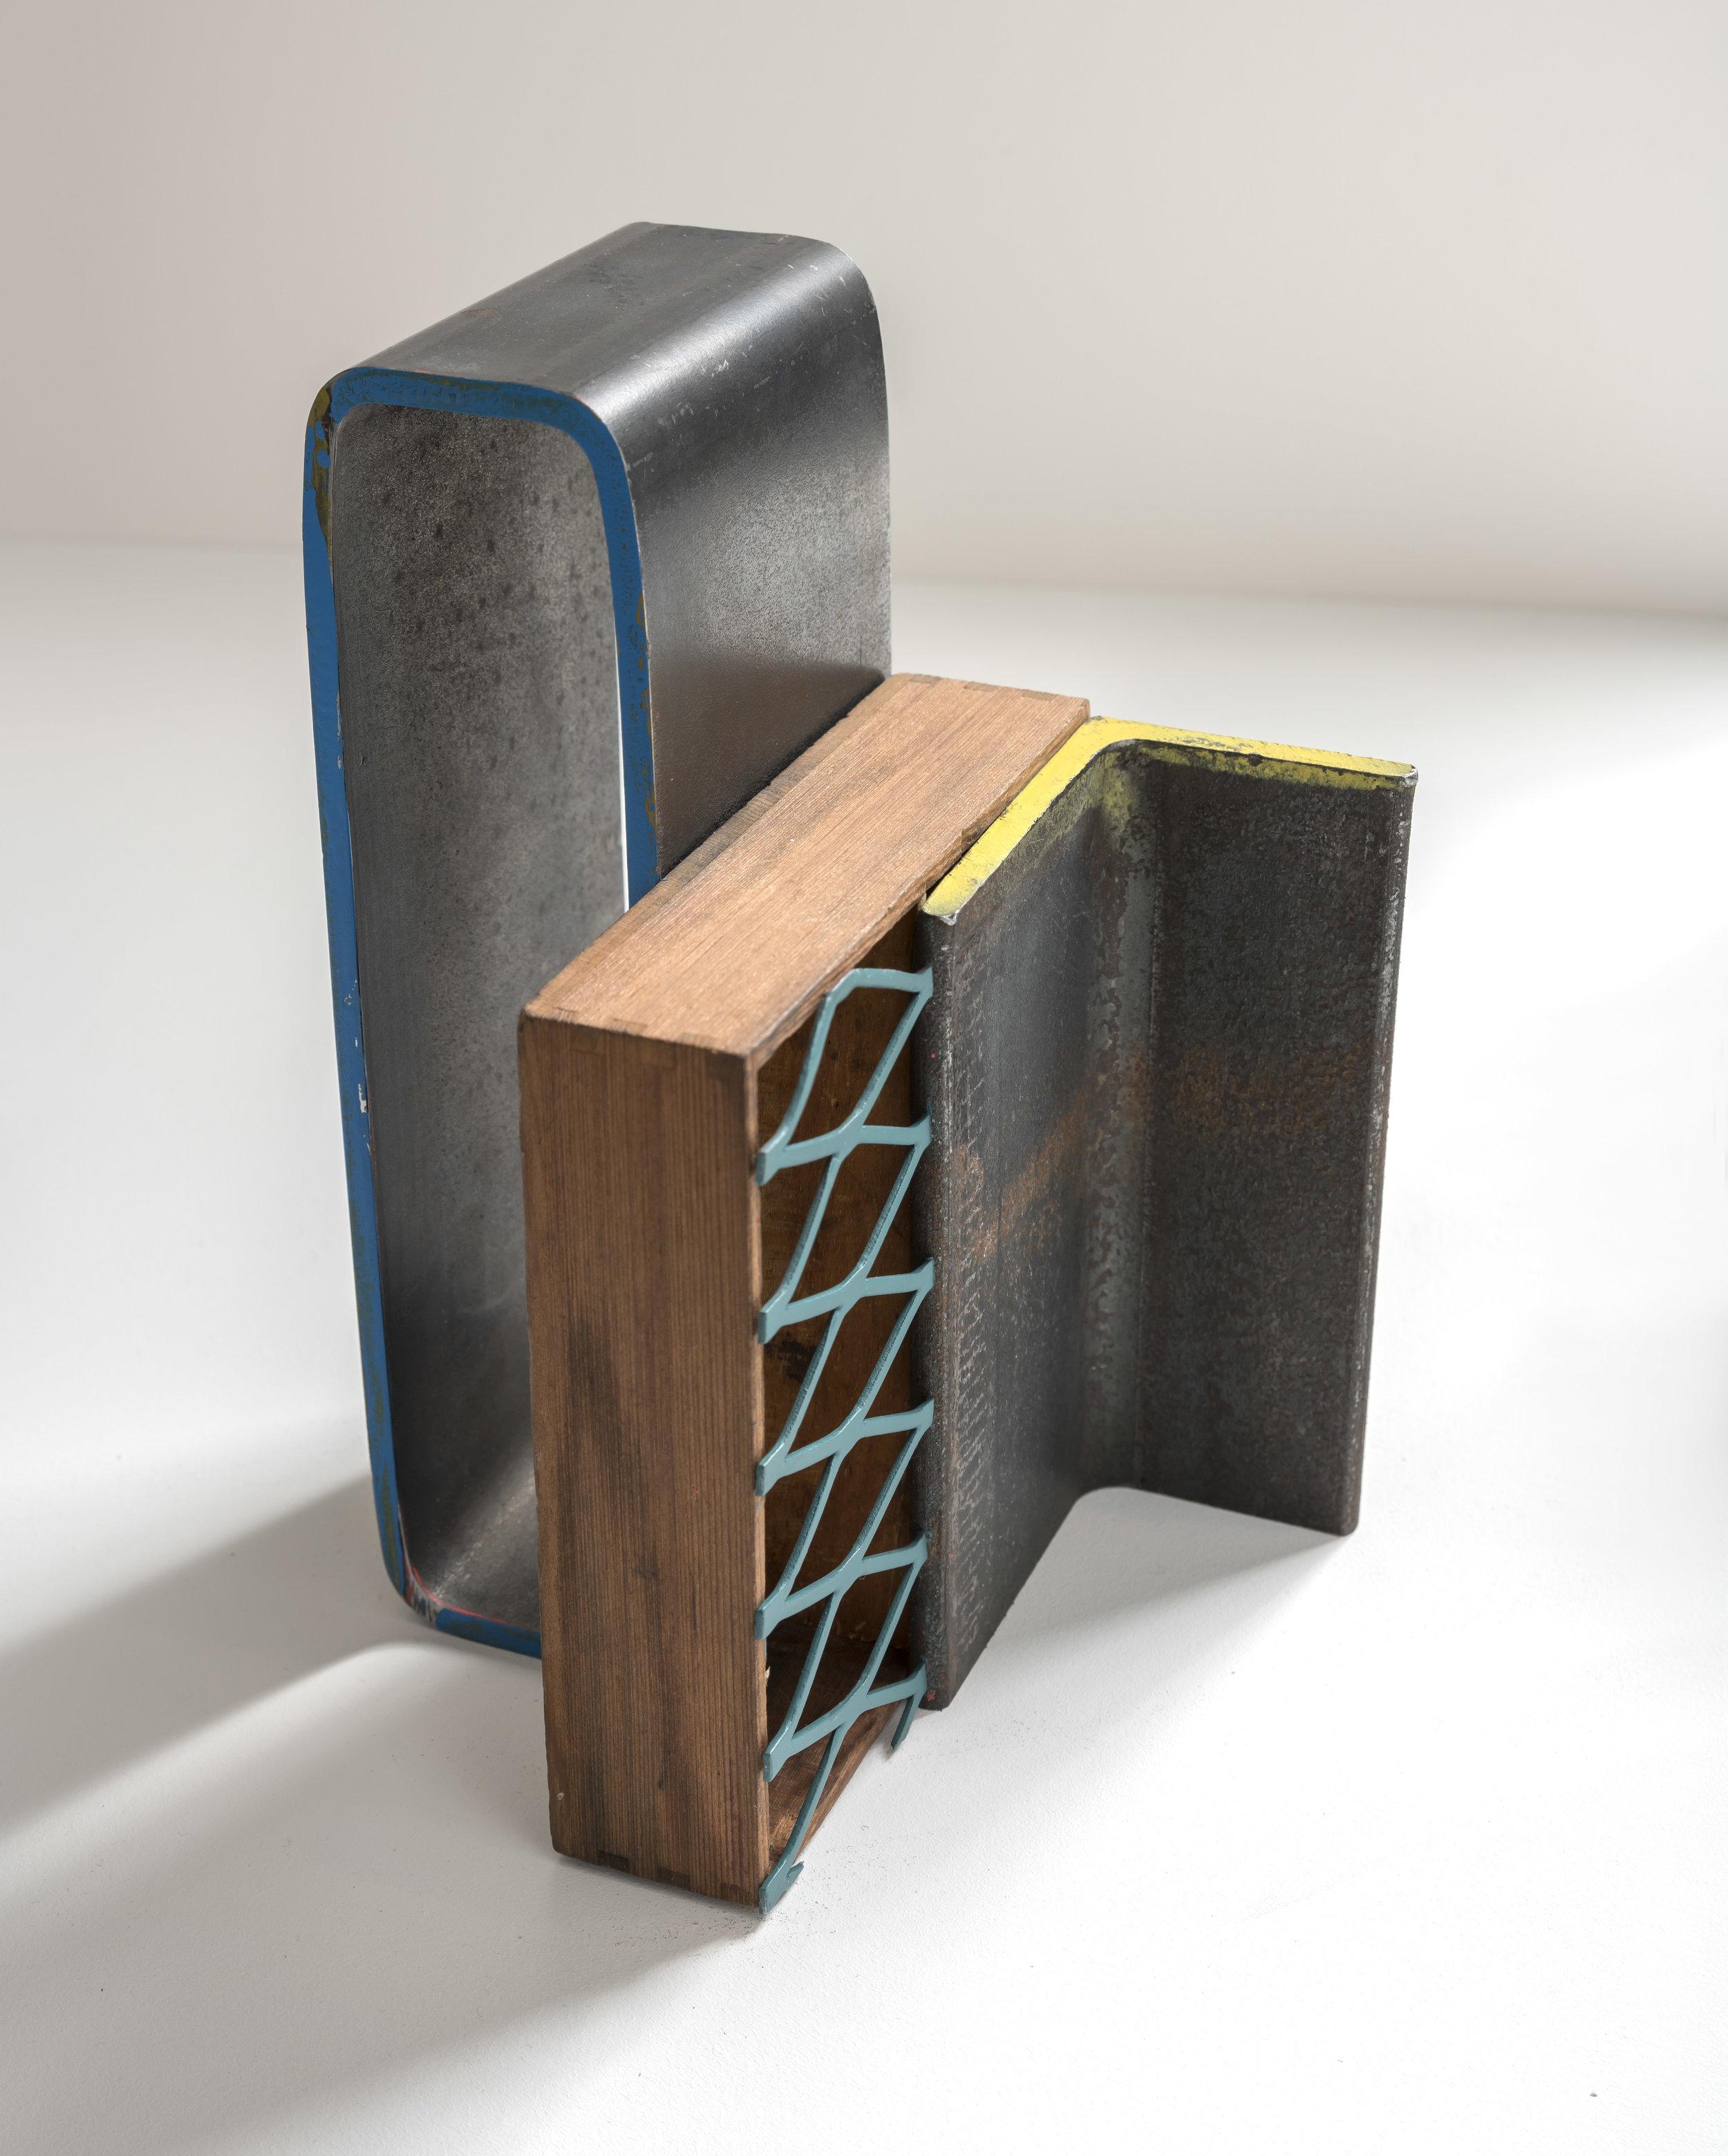 Assemblage ll , 2019 steel, wood, magnet, aerosol paint 5 1/2 x 8 x 5 3/8 inches; 14 x 20.3 x 13.7 centimeters